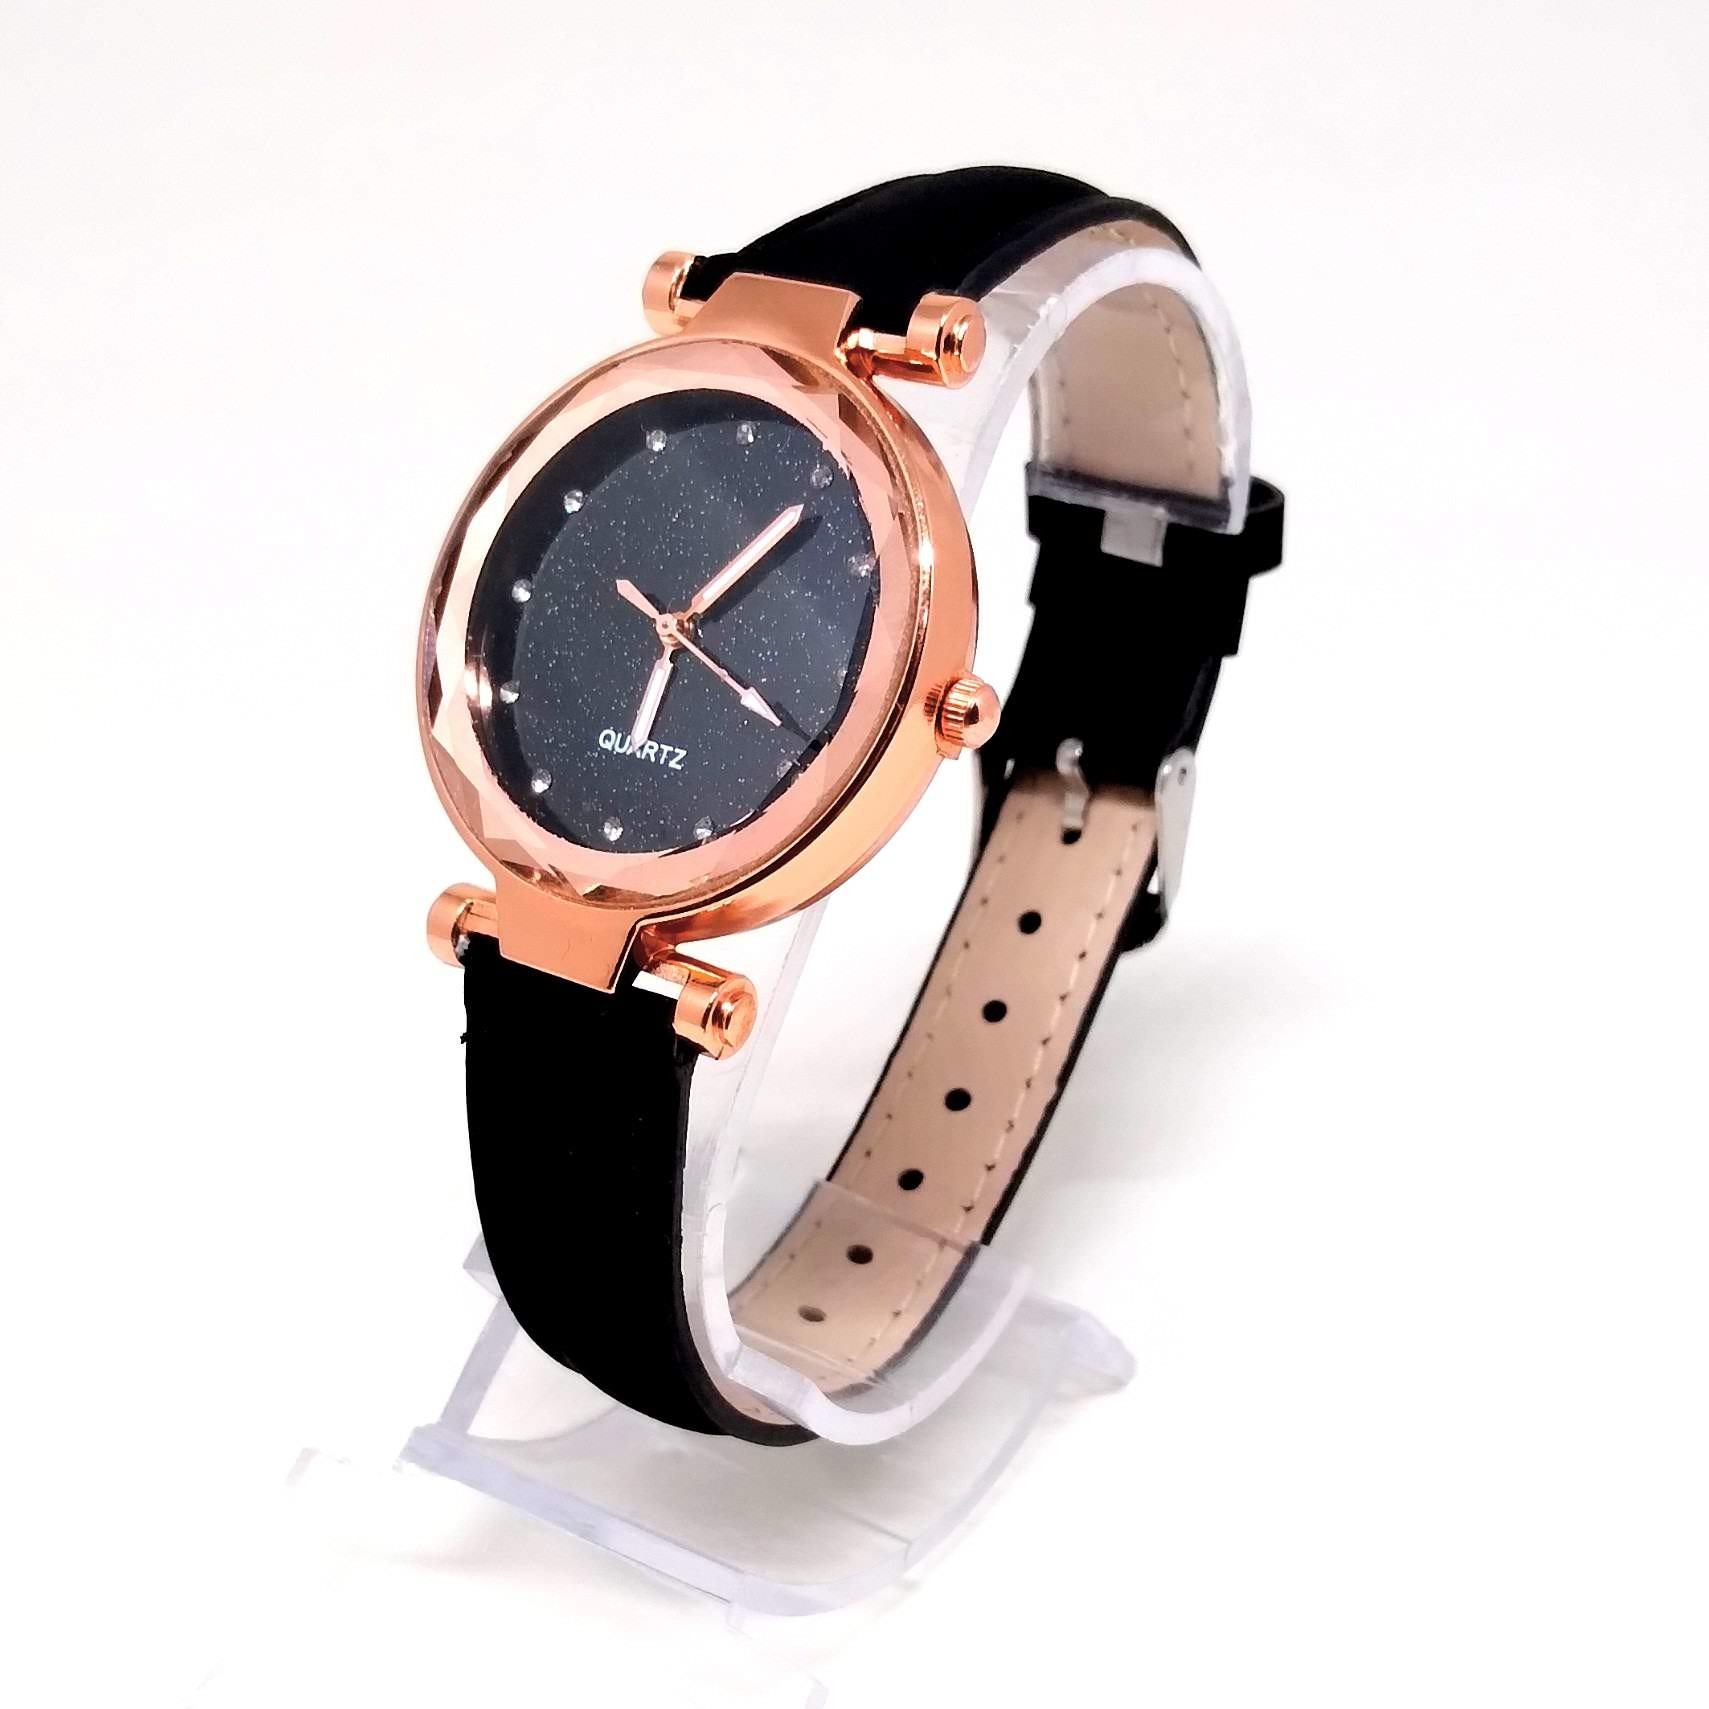 Relógio Feminino Preto com Strass Black Shine Lova